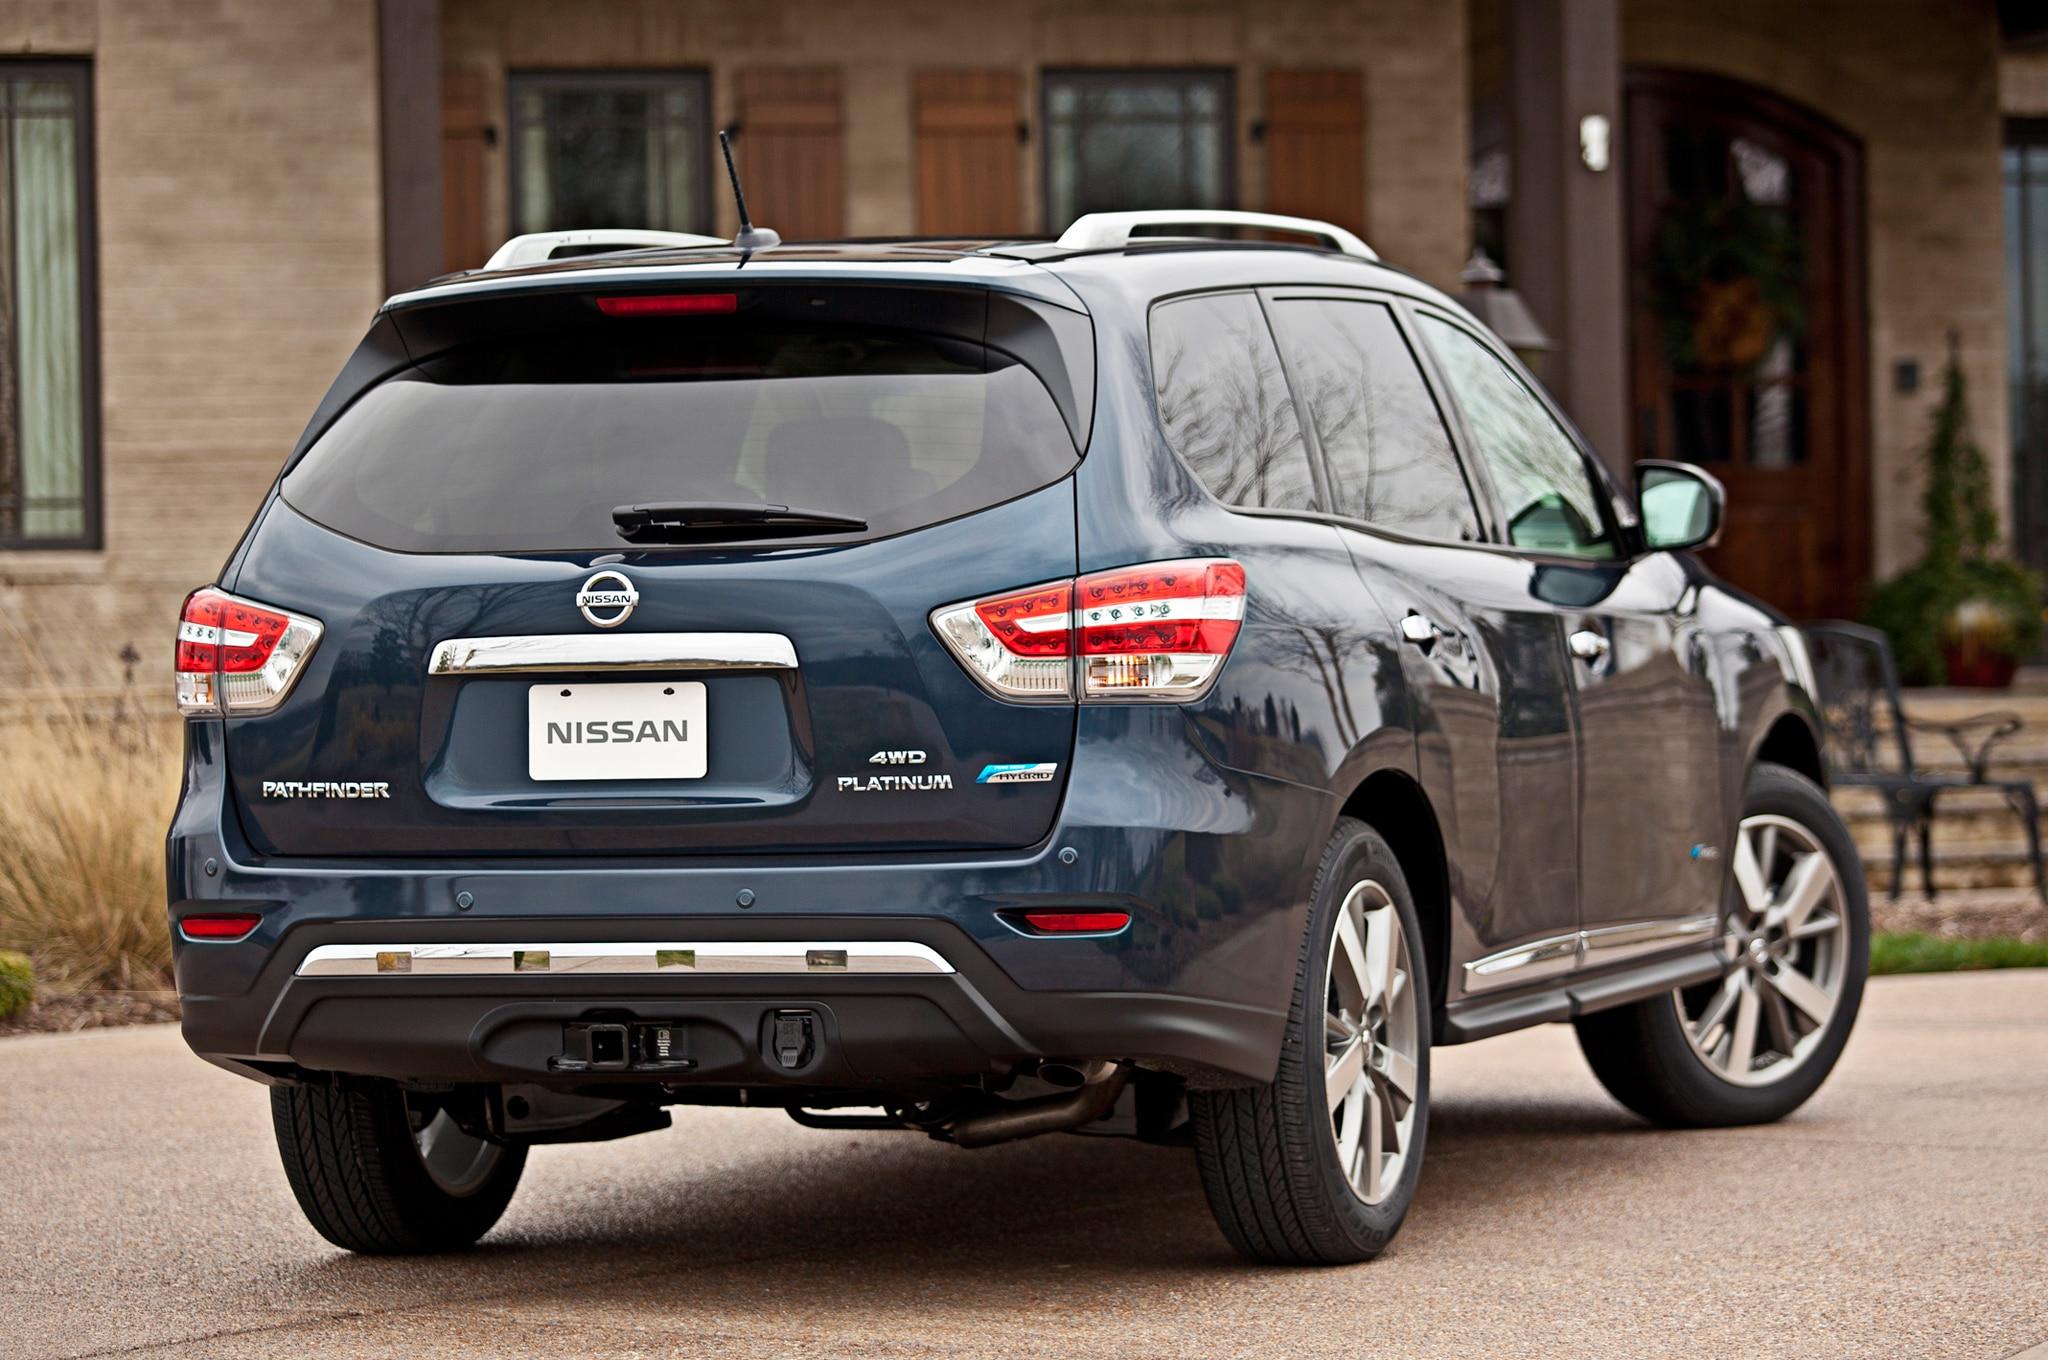 Nissan Pathfinder Hybrid Infiniti QX60 Hybrid Discontinued